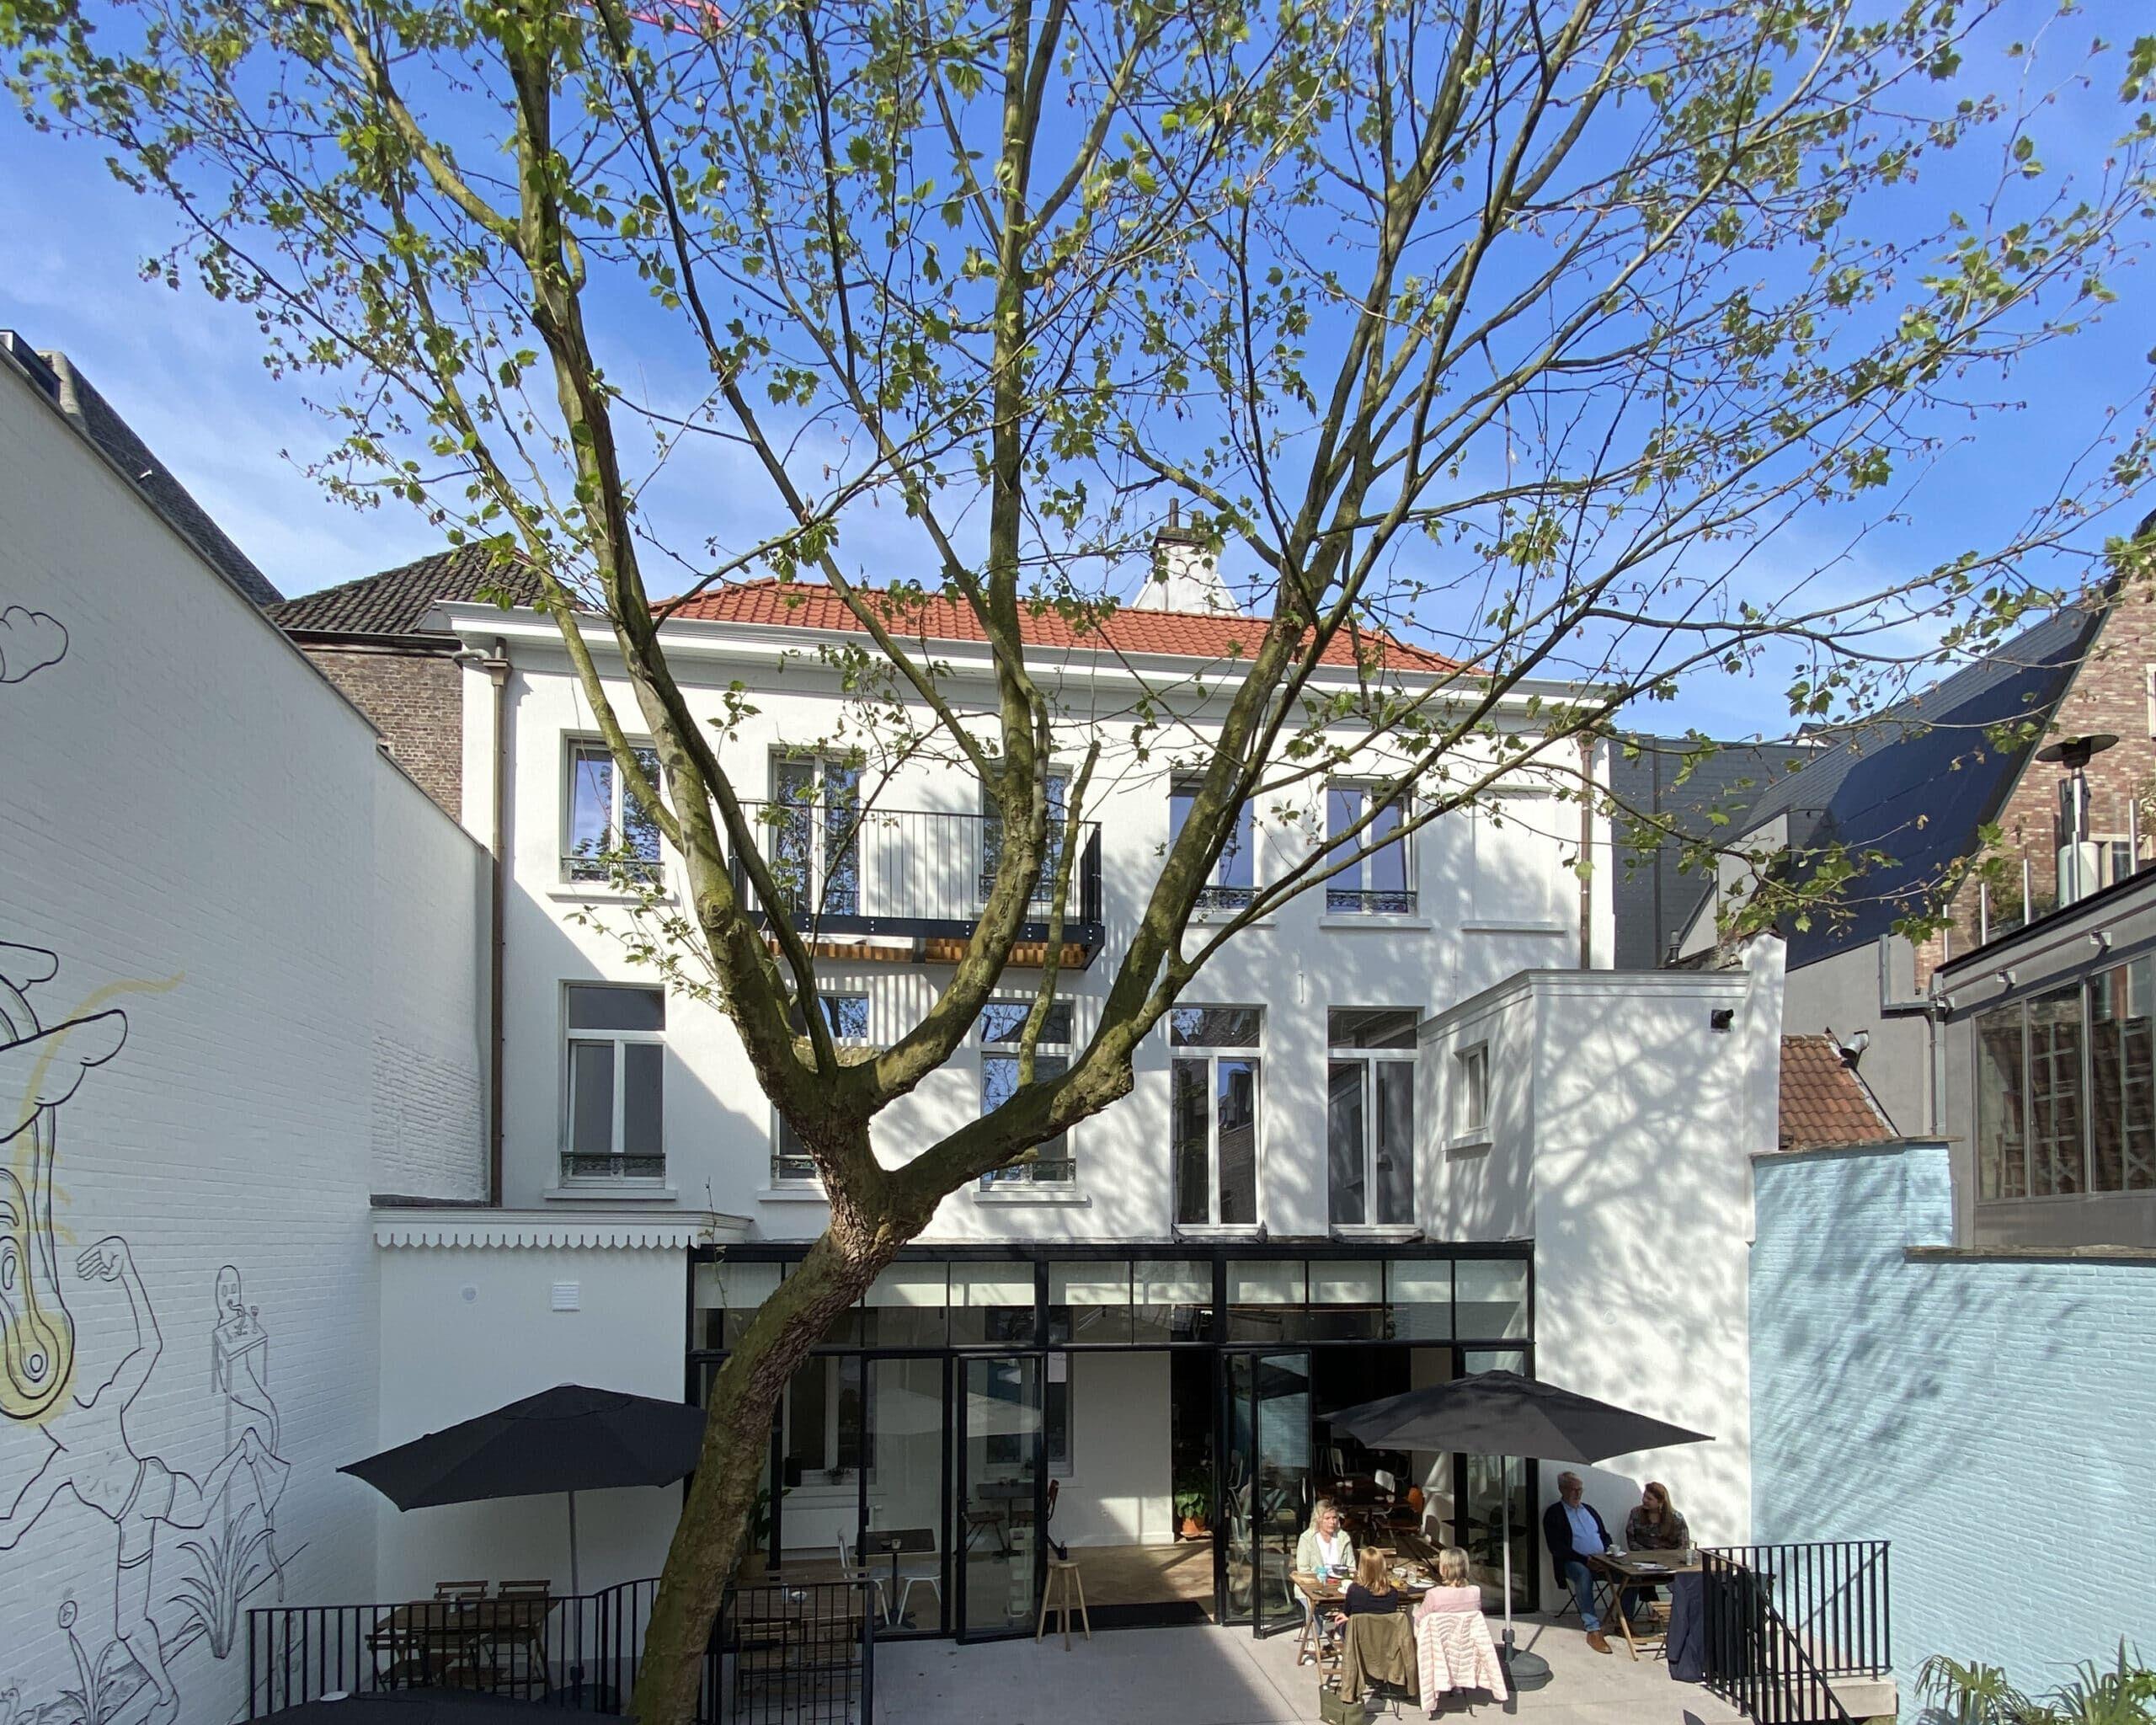 IMG 8181 2 kopie scaled uai | Baeyens & Beck architecten Gent | architect nieuwbouw renovatie interieur | high end | architectenbureau